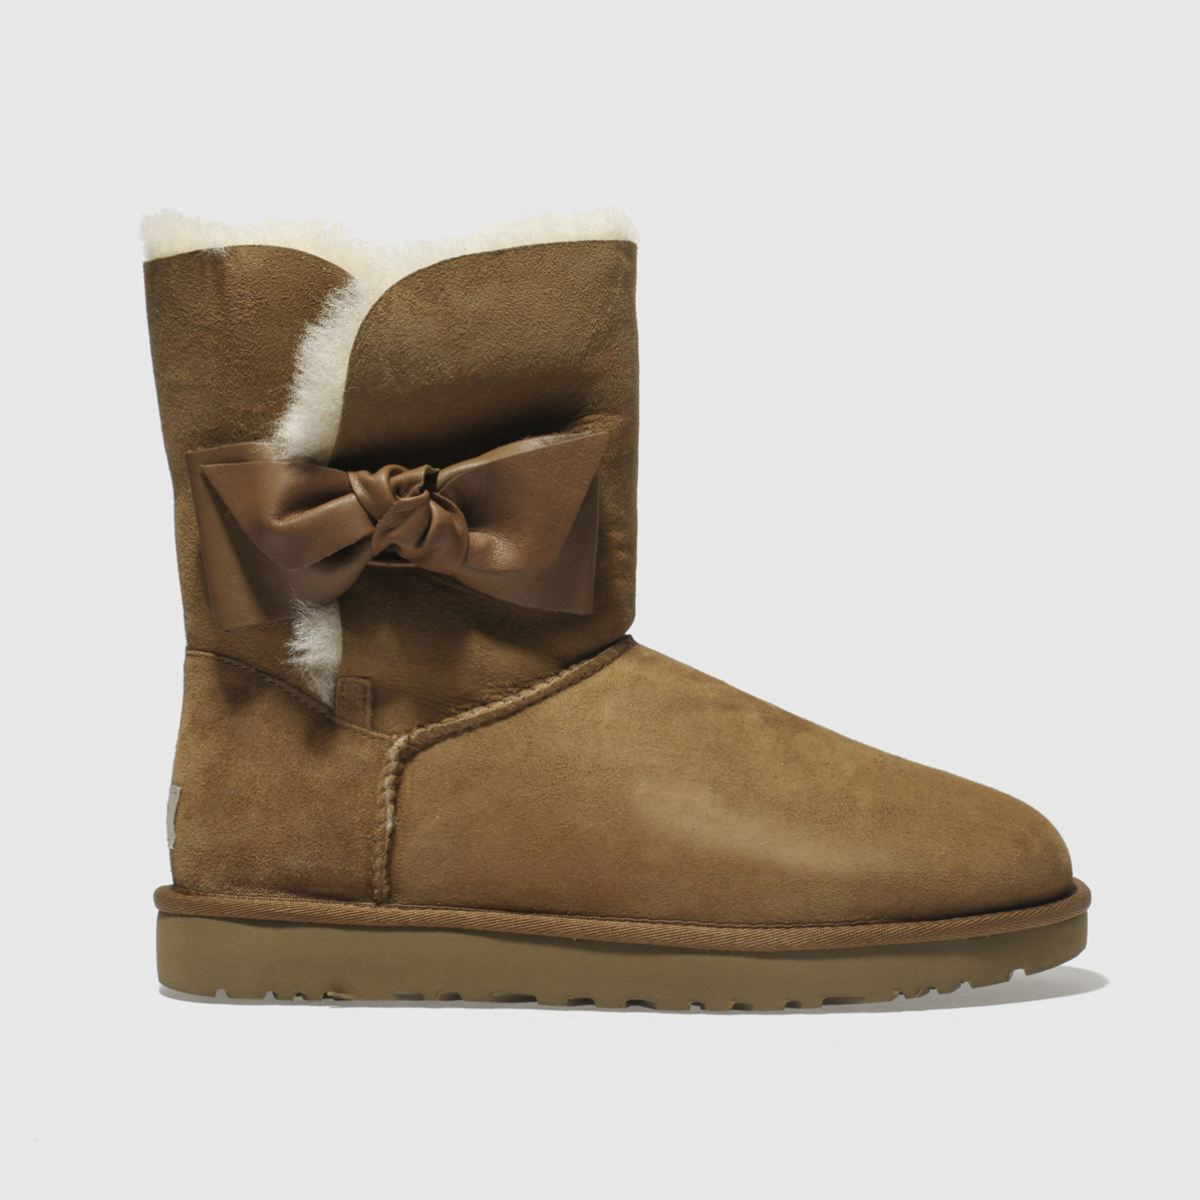 Ugg Tan Daelynn Boots